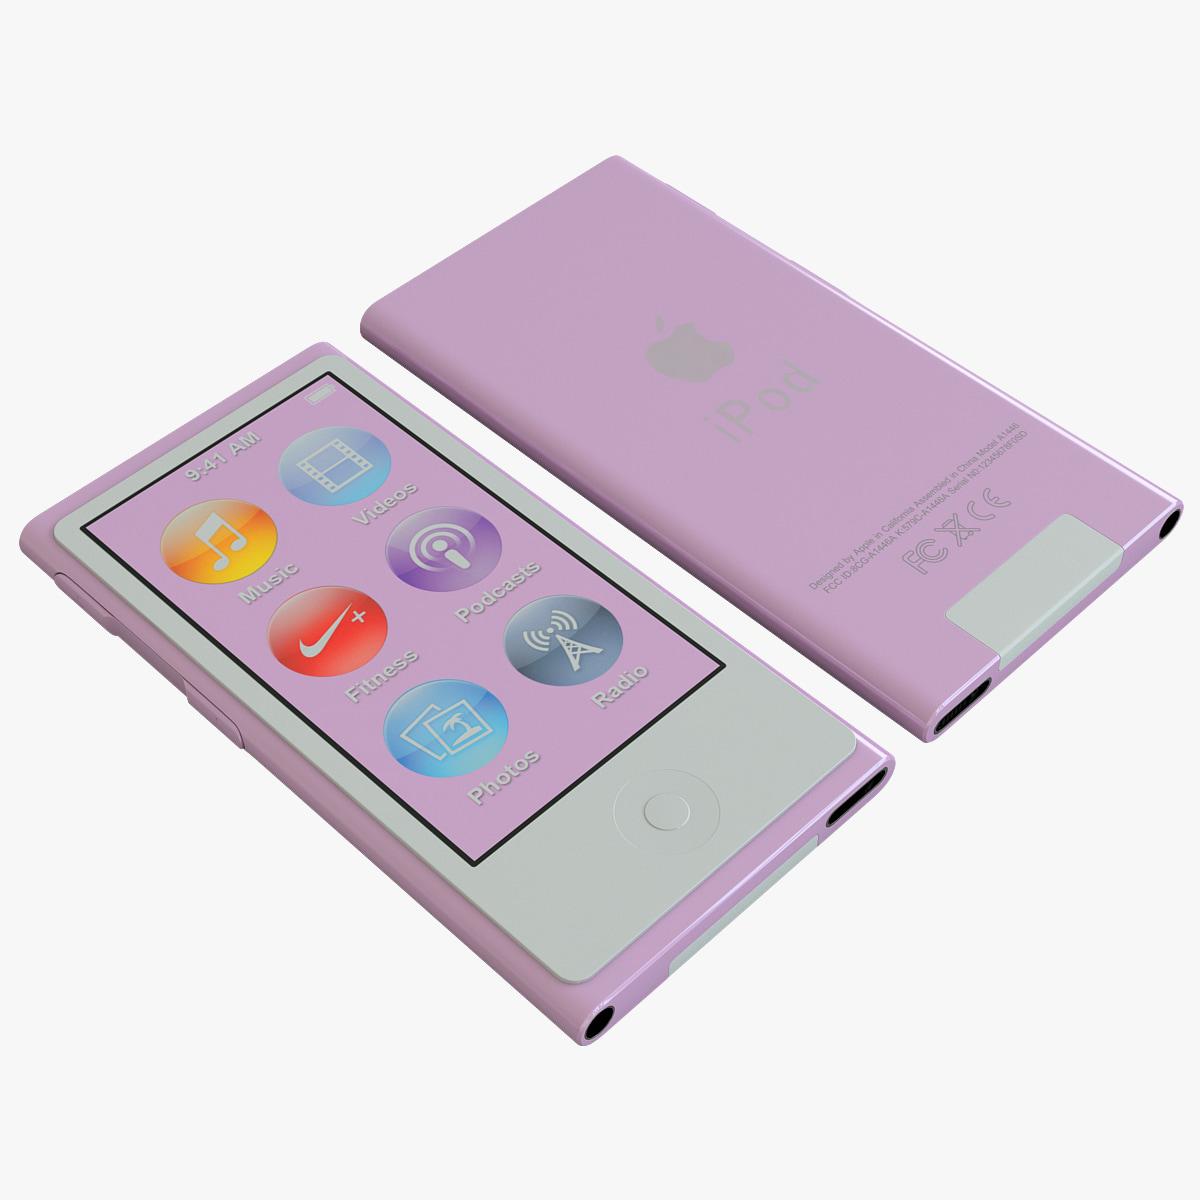 Ipod_Nano_Generation_7th_Pink_000.jpg